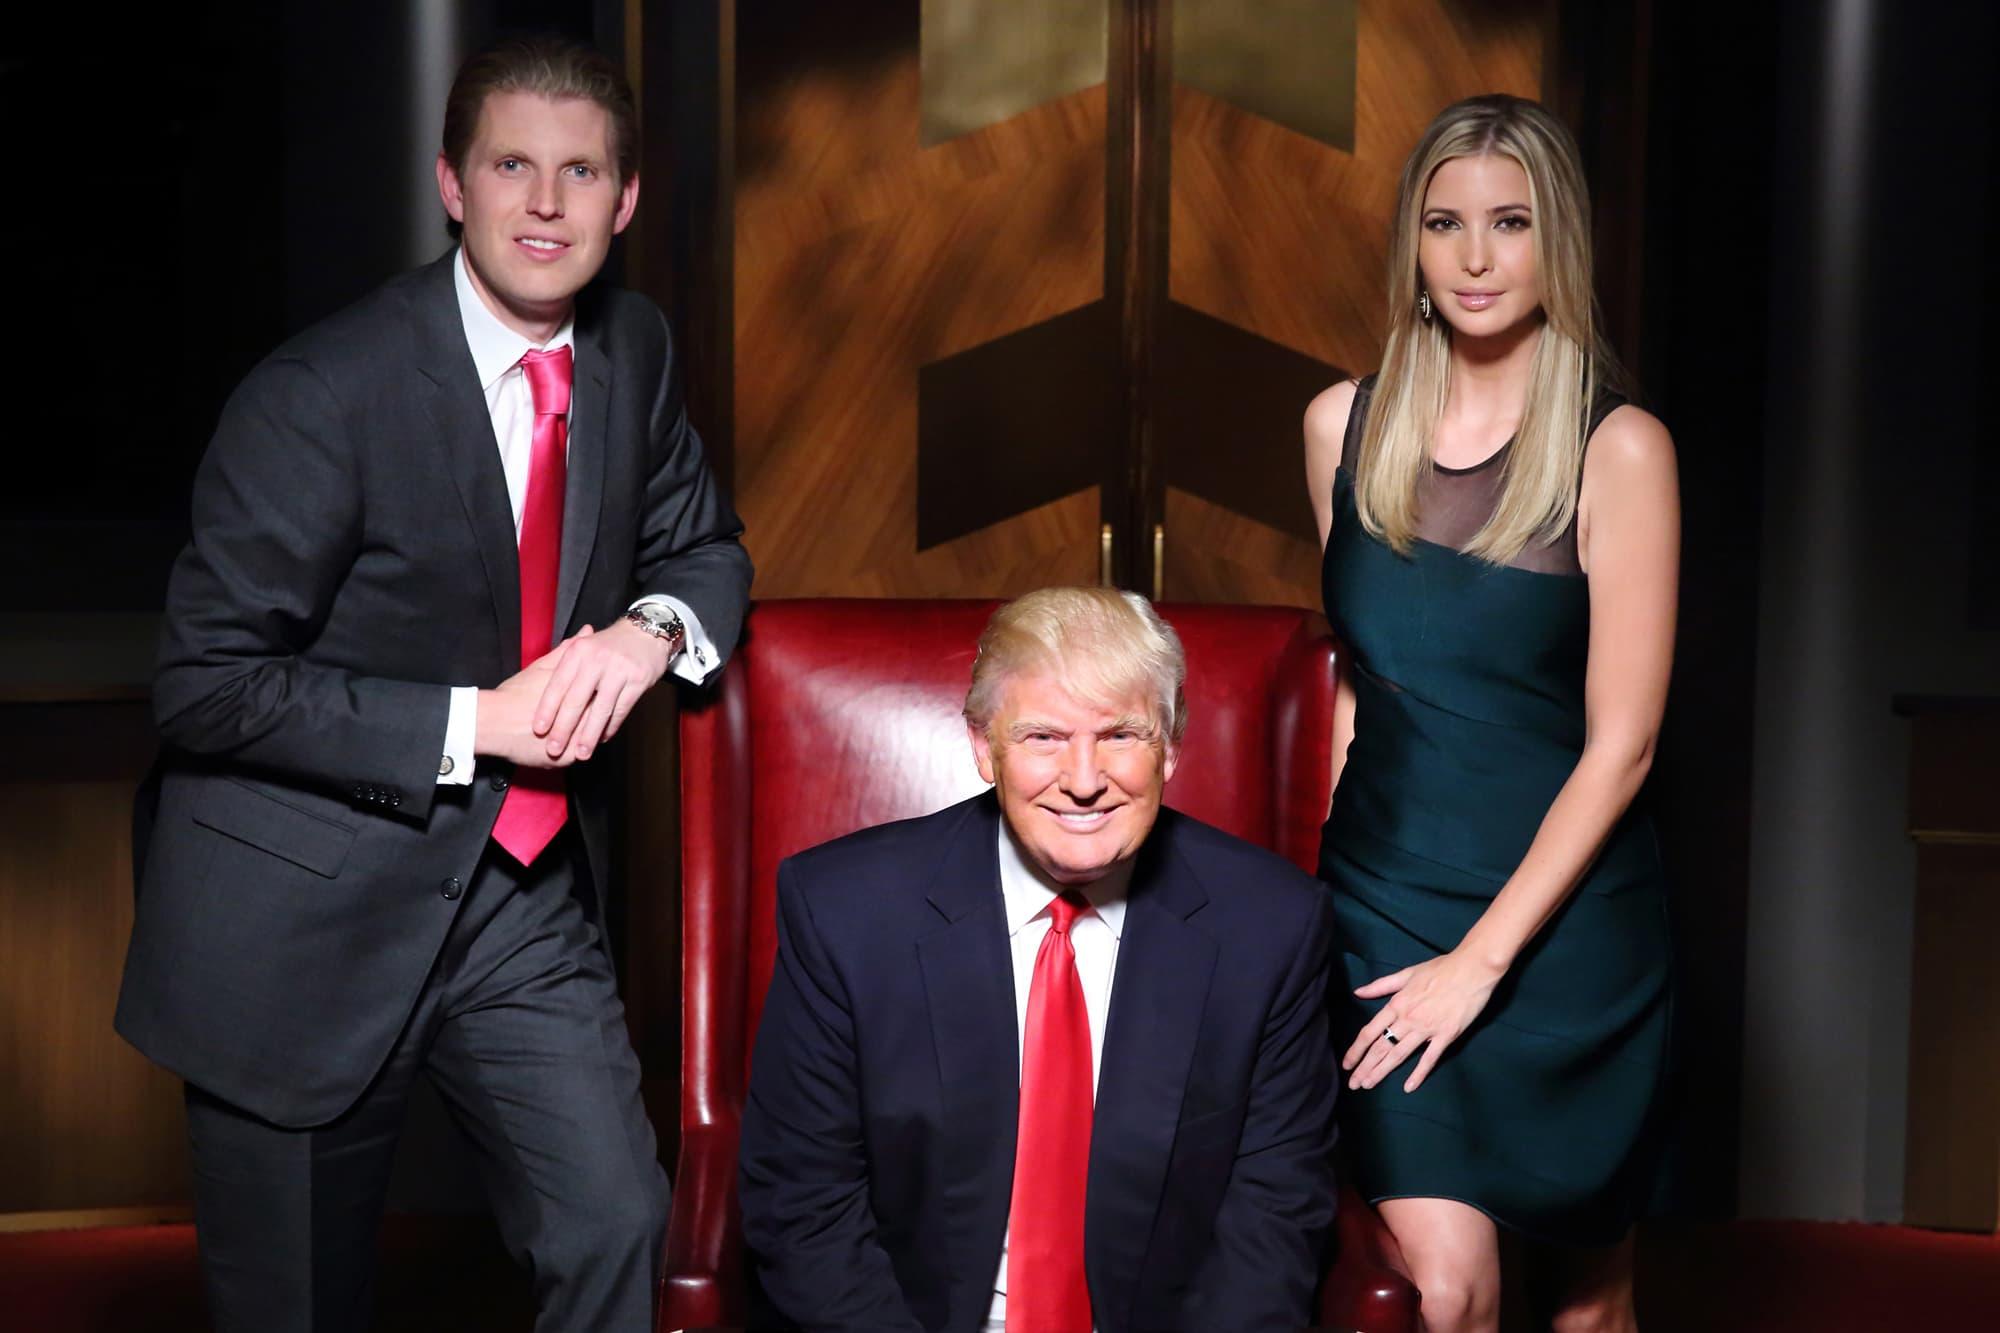 Donald Trump Jr., Donald Trump, Ivanka Trump on Celebrity Apprentice